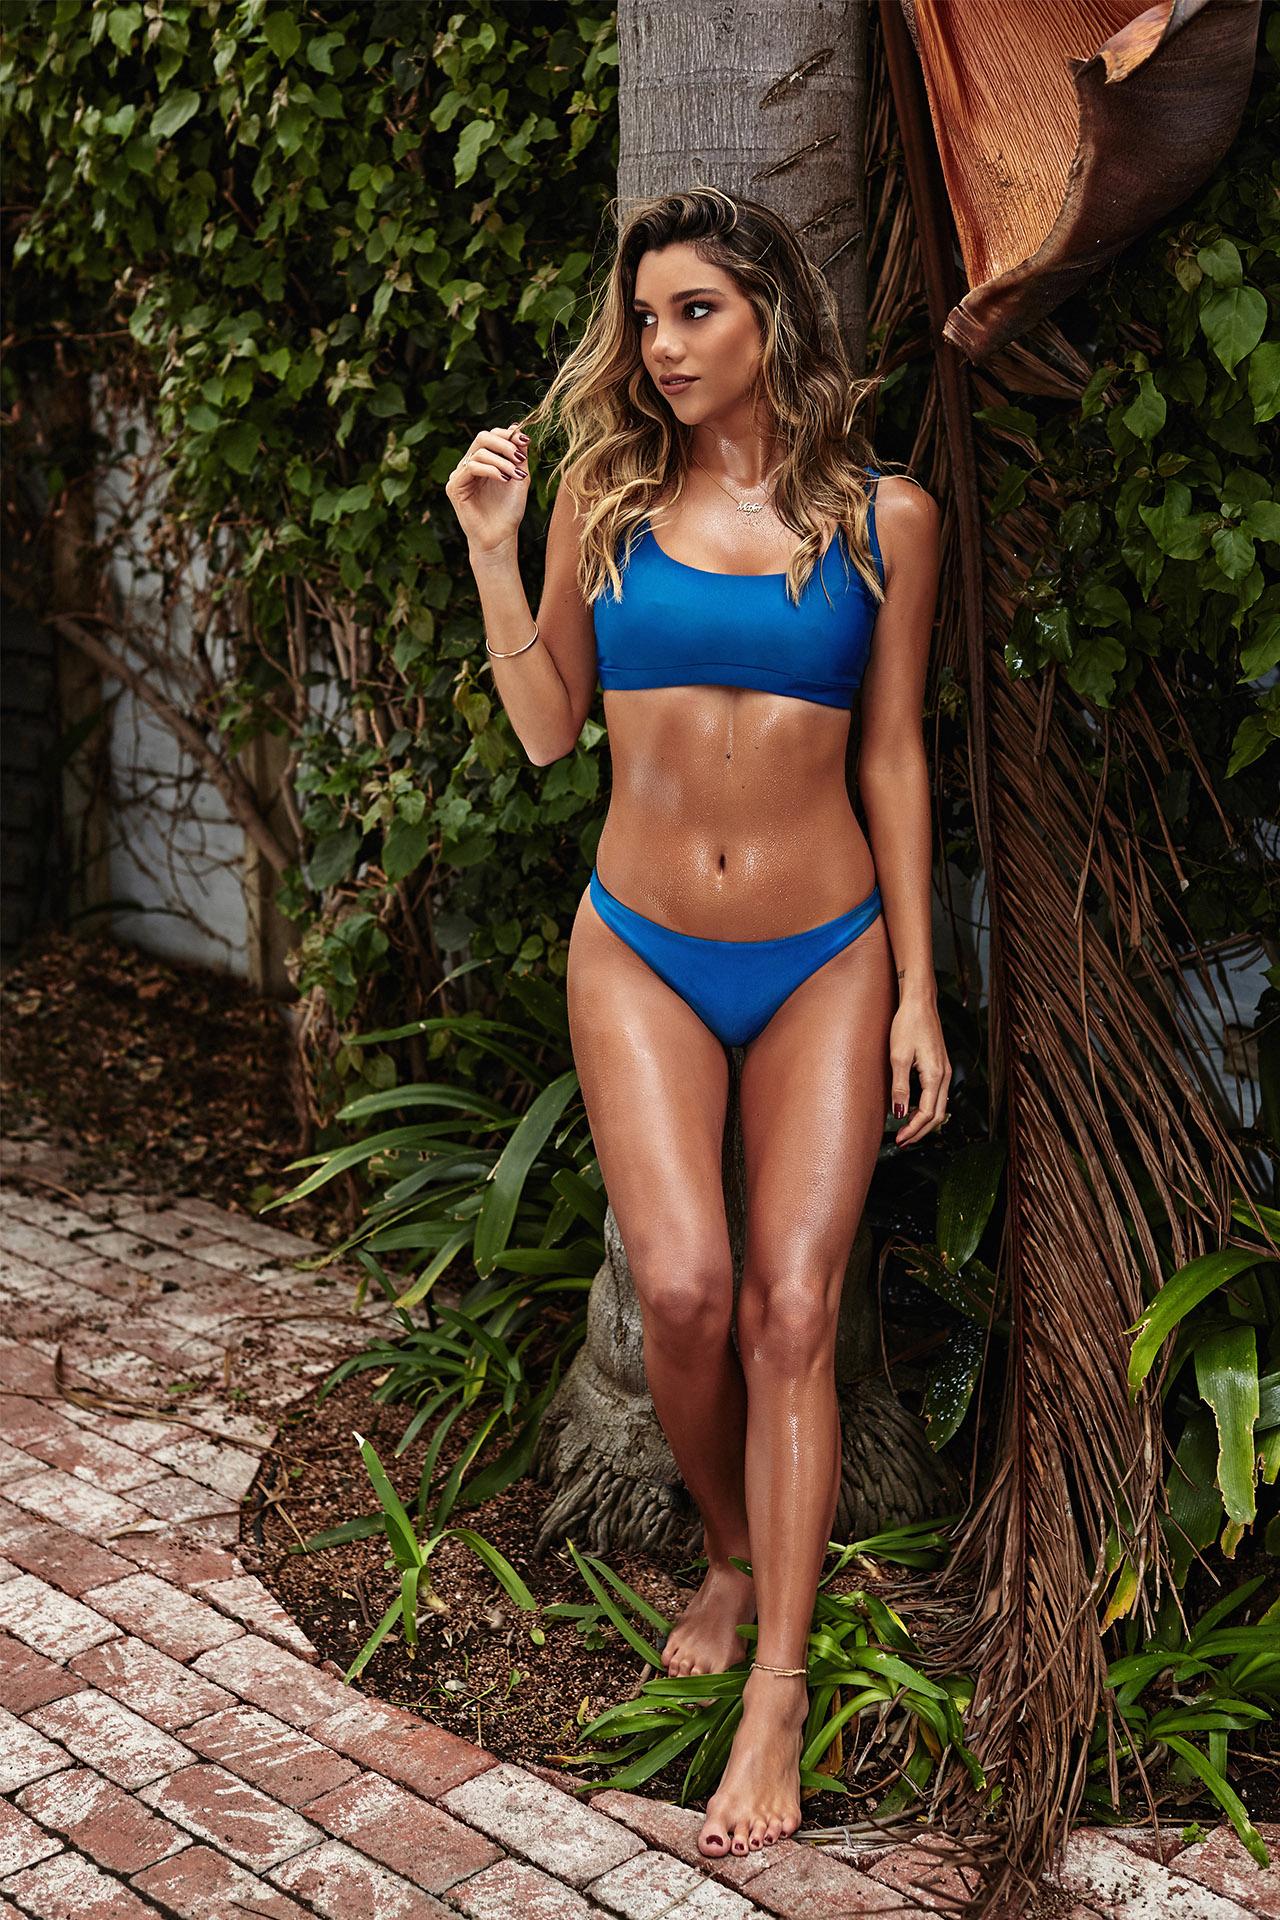 Bikini con corte brasilero de color azul.